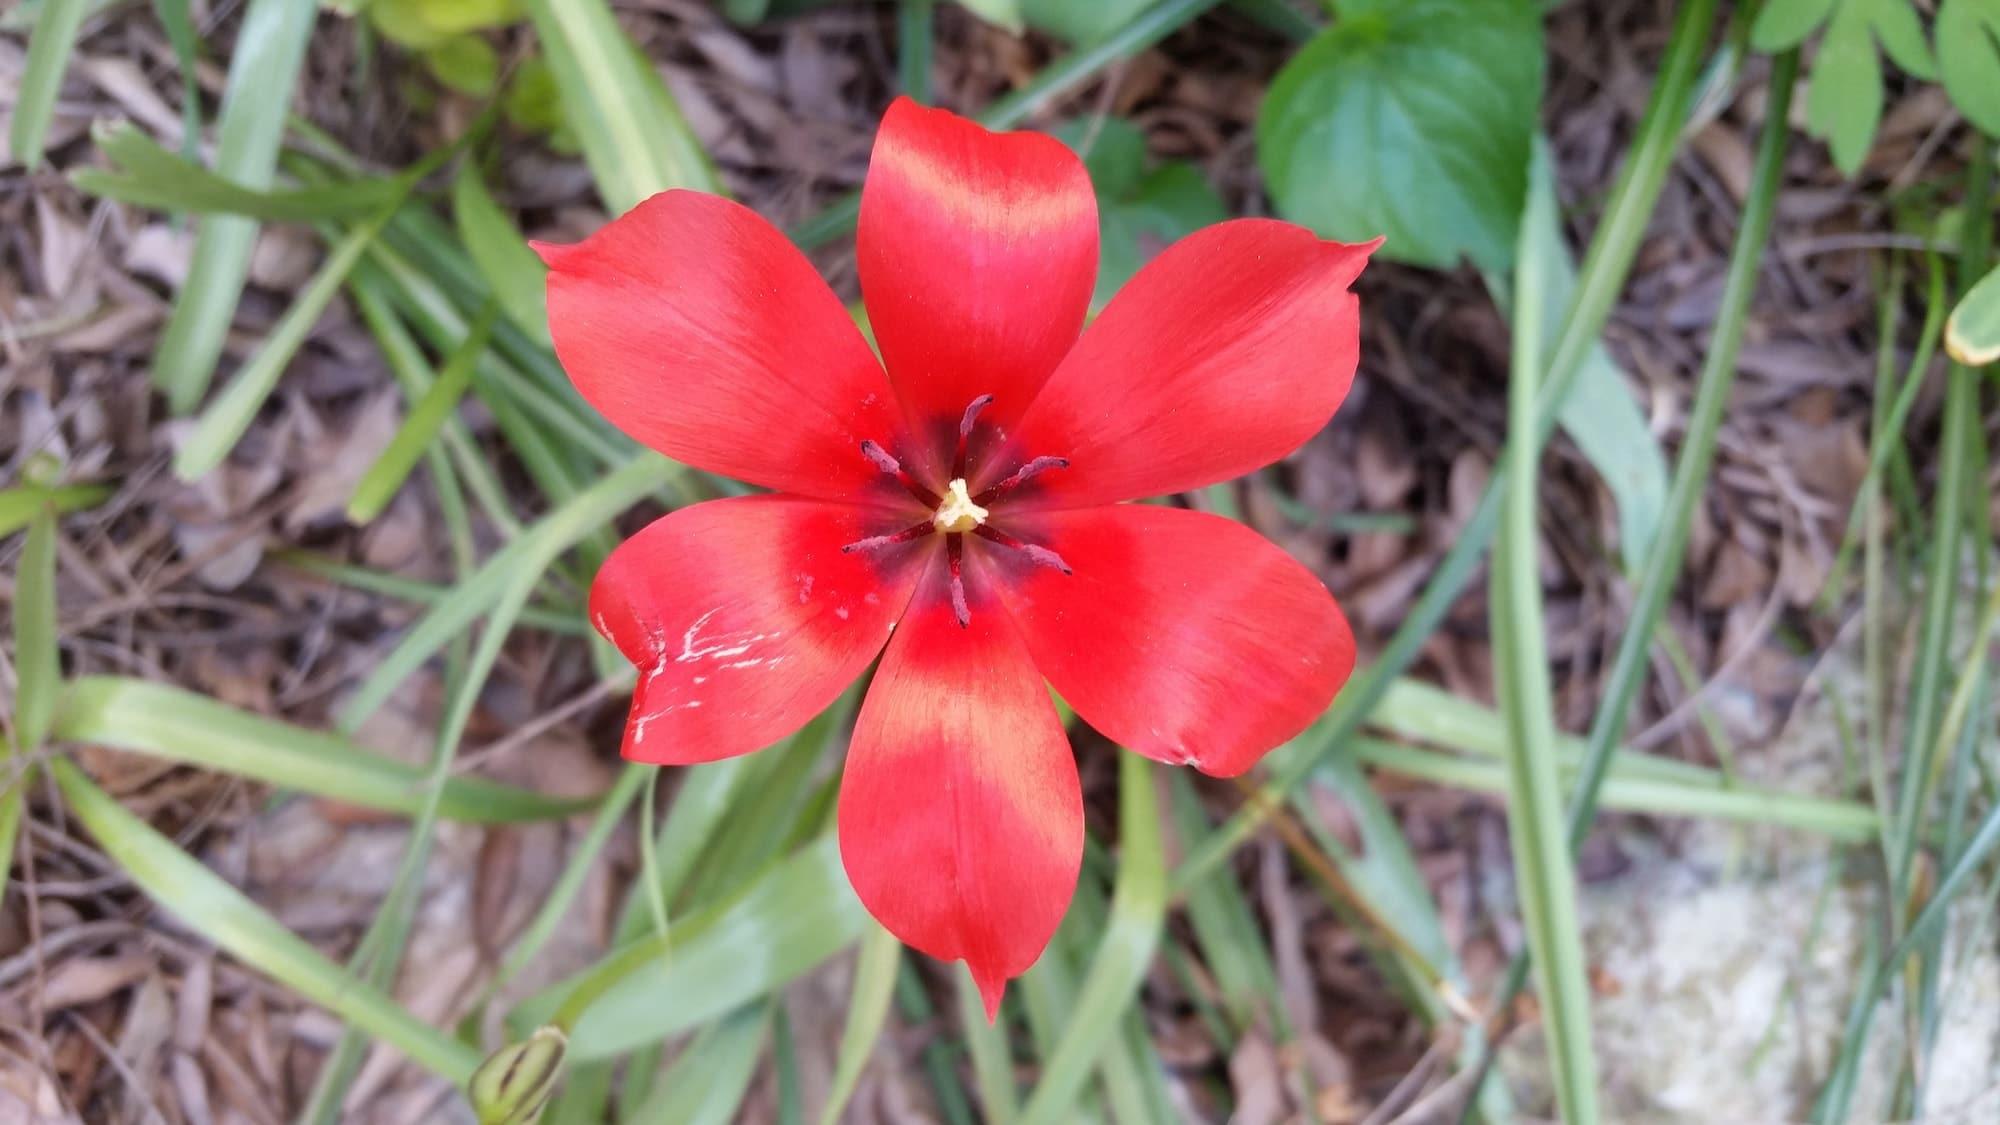 red species tulip